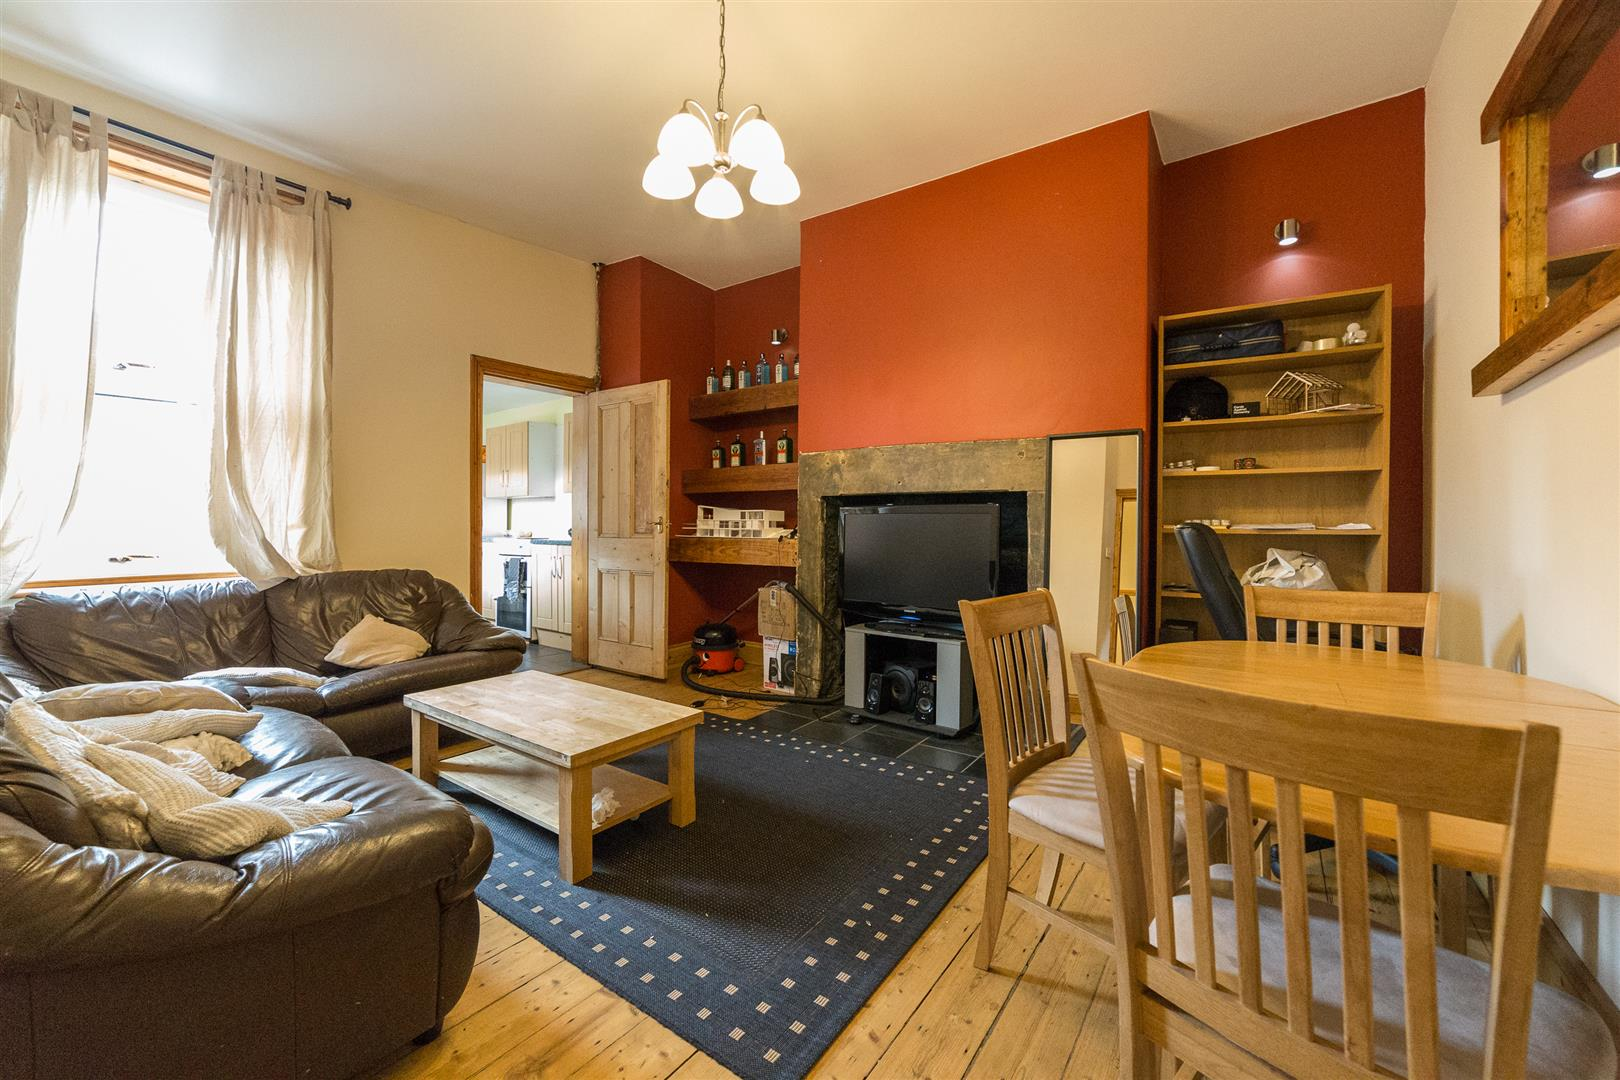 3 bed flat to rent in Fenham, NE4 5AD  - Property Image 1